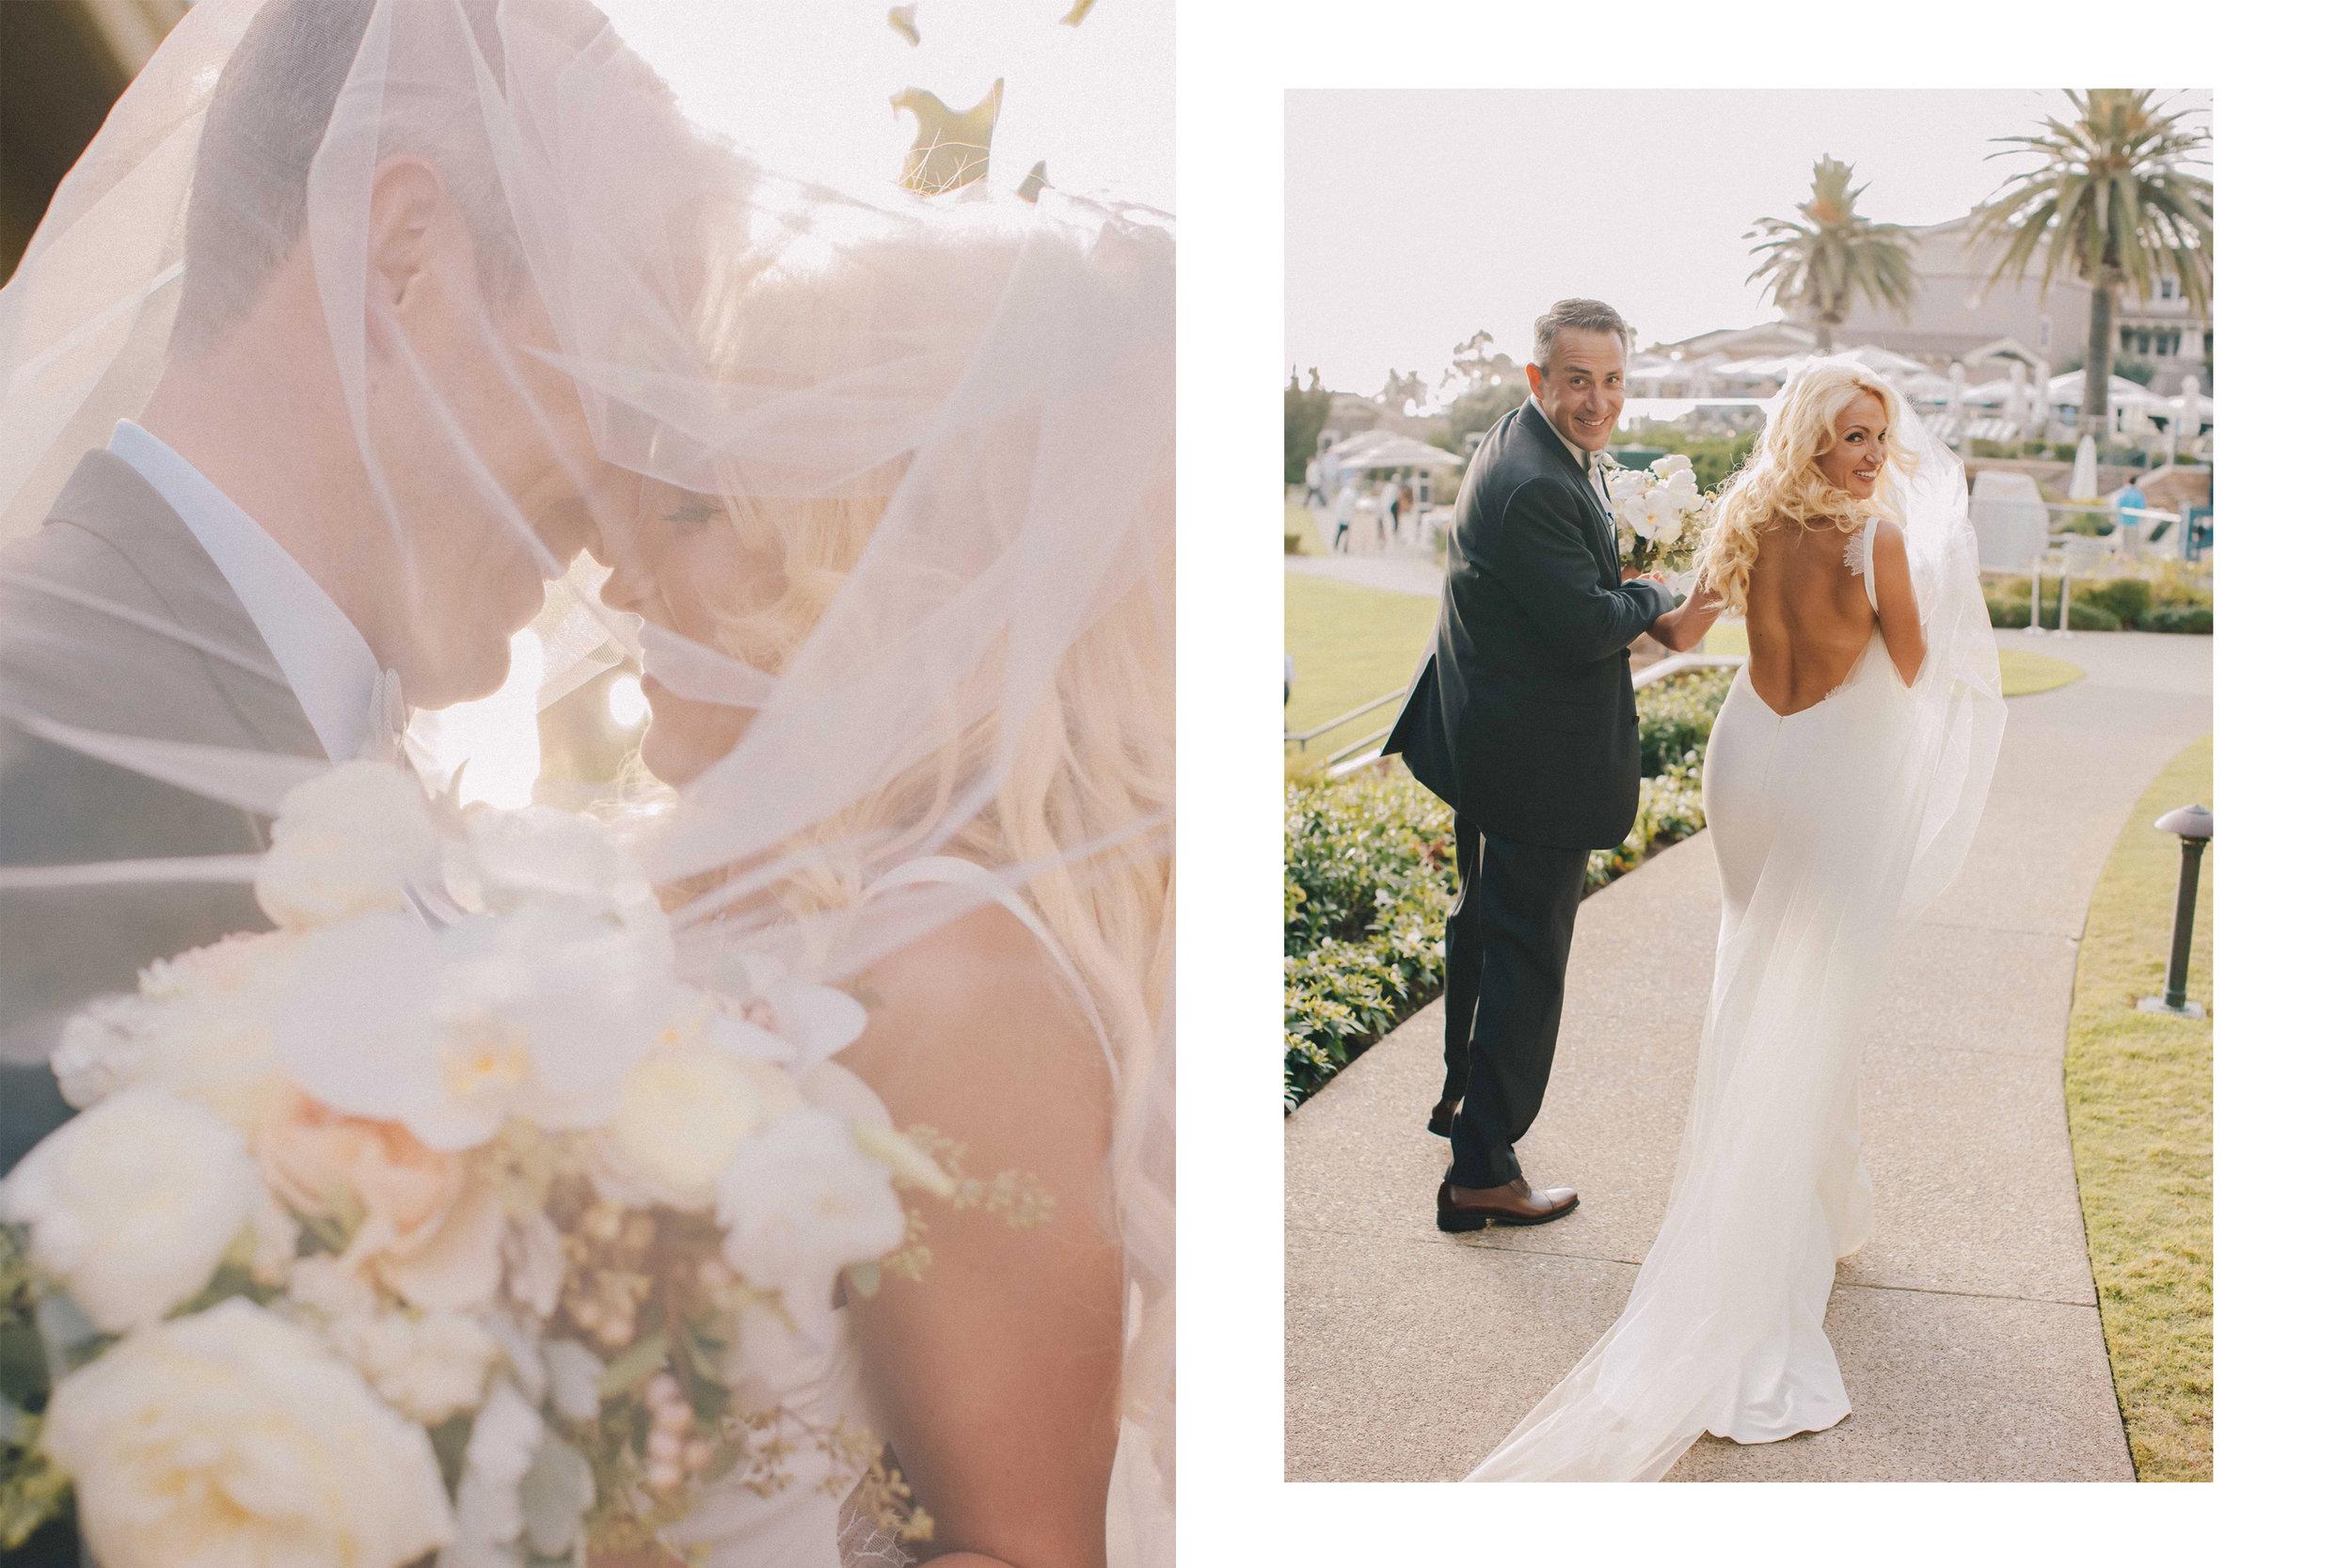 karlaticas_wedding1.jpg